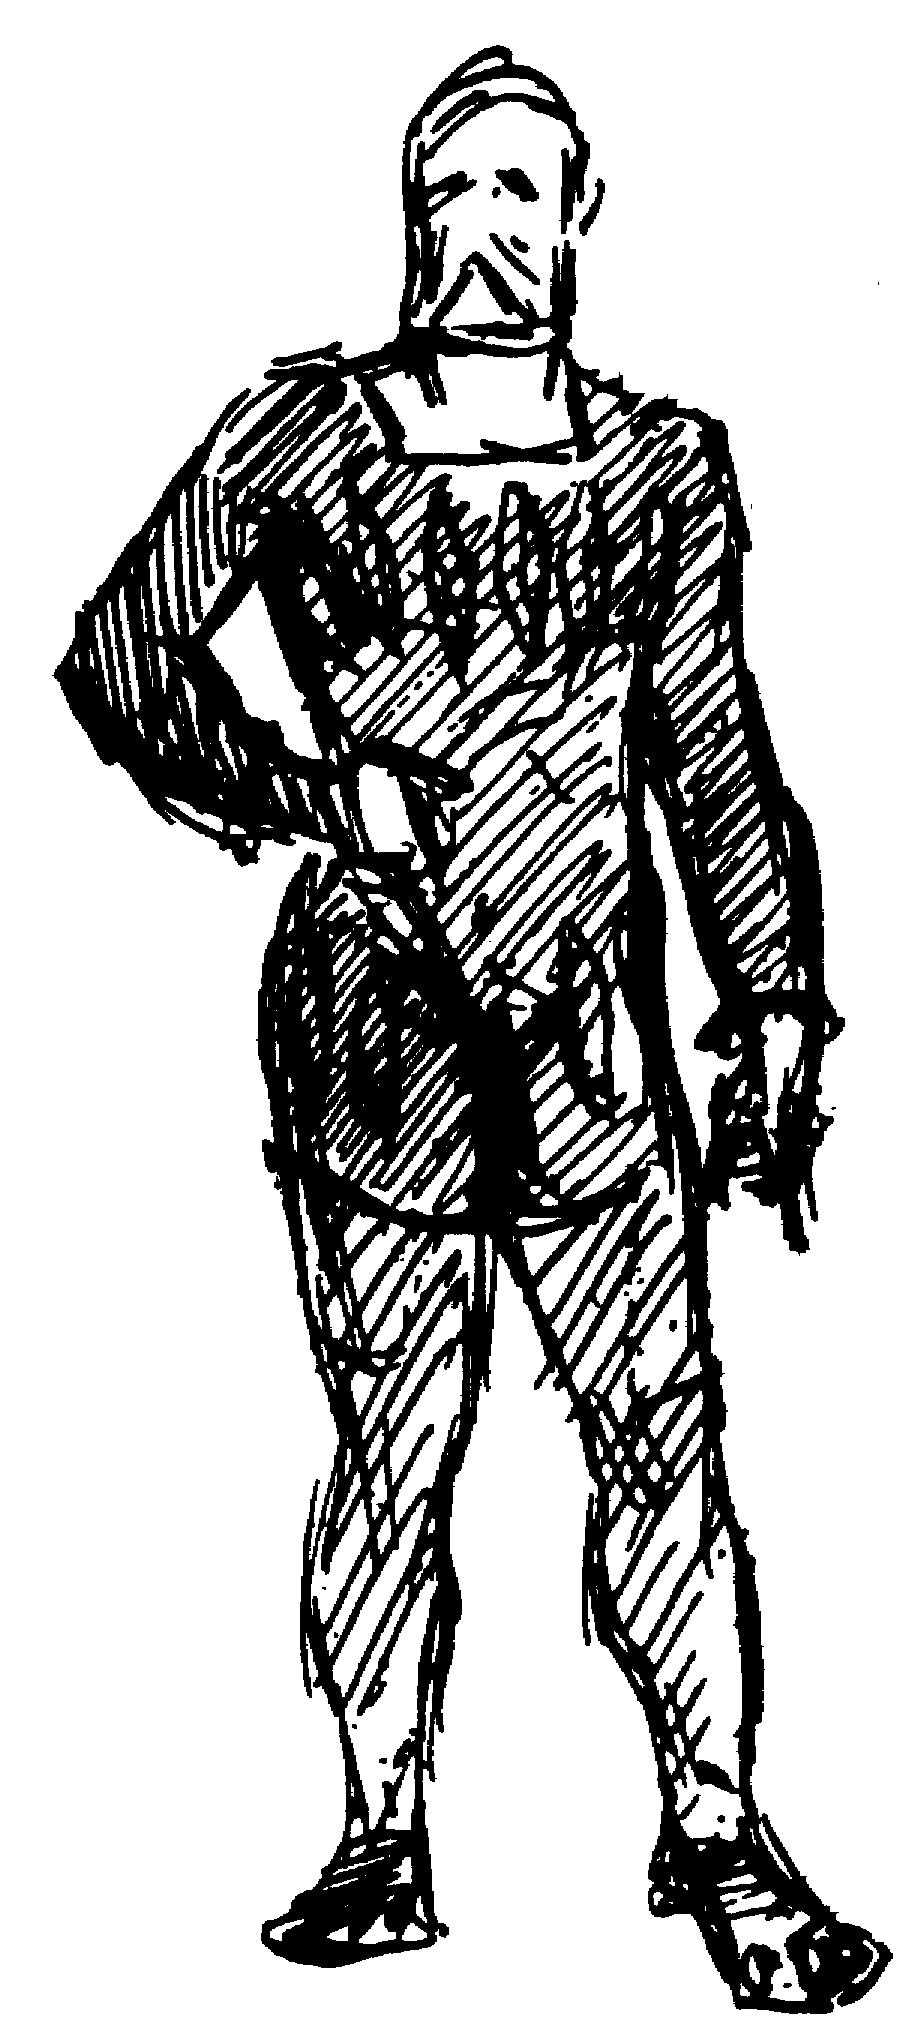 Gilbert sketch of a Shape suit